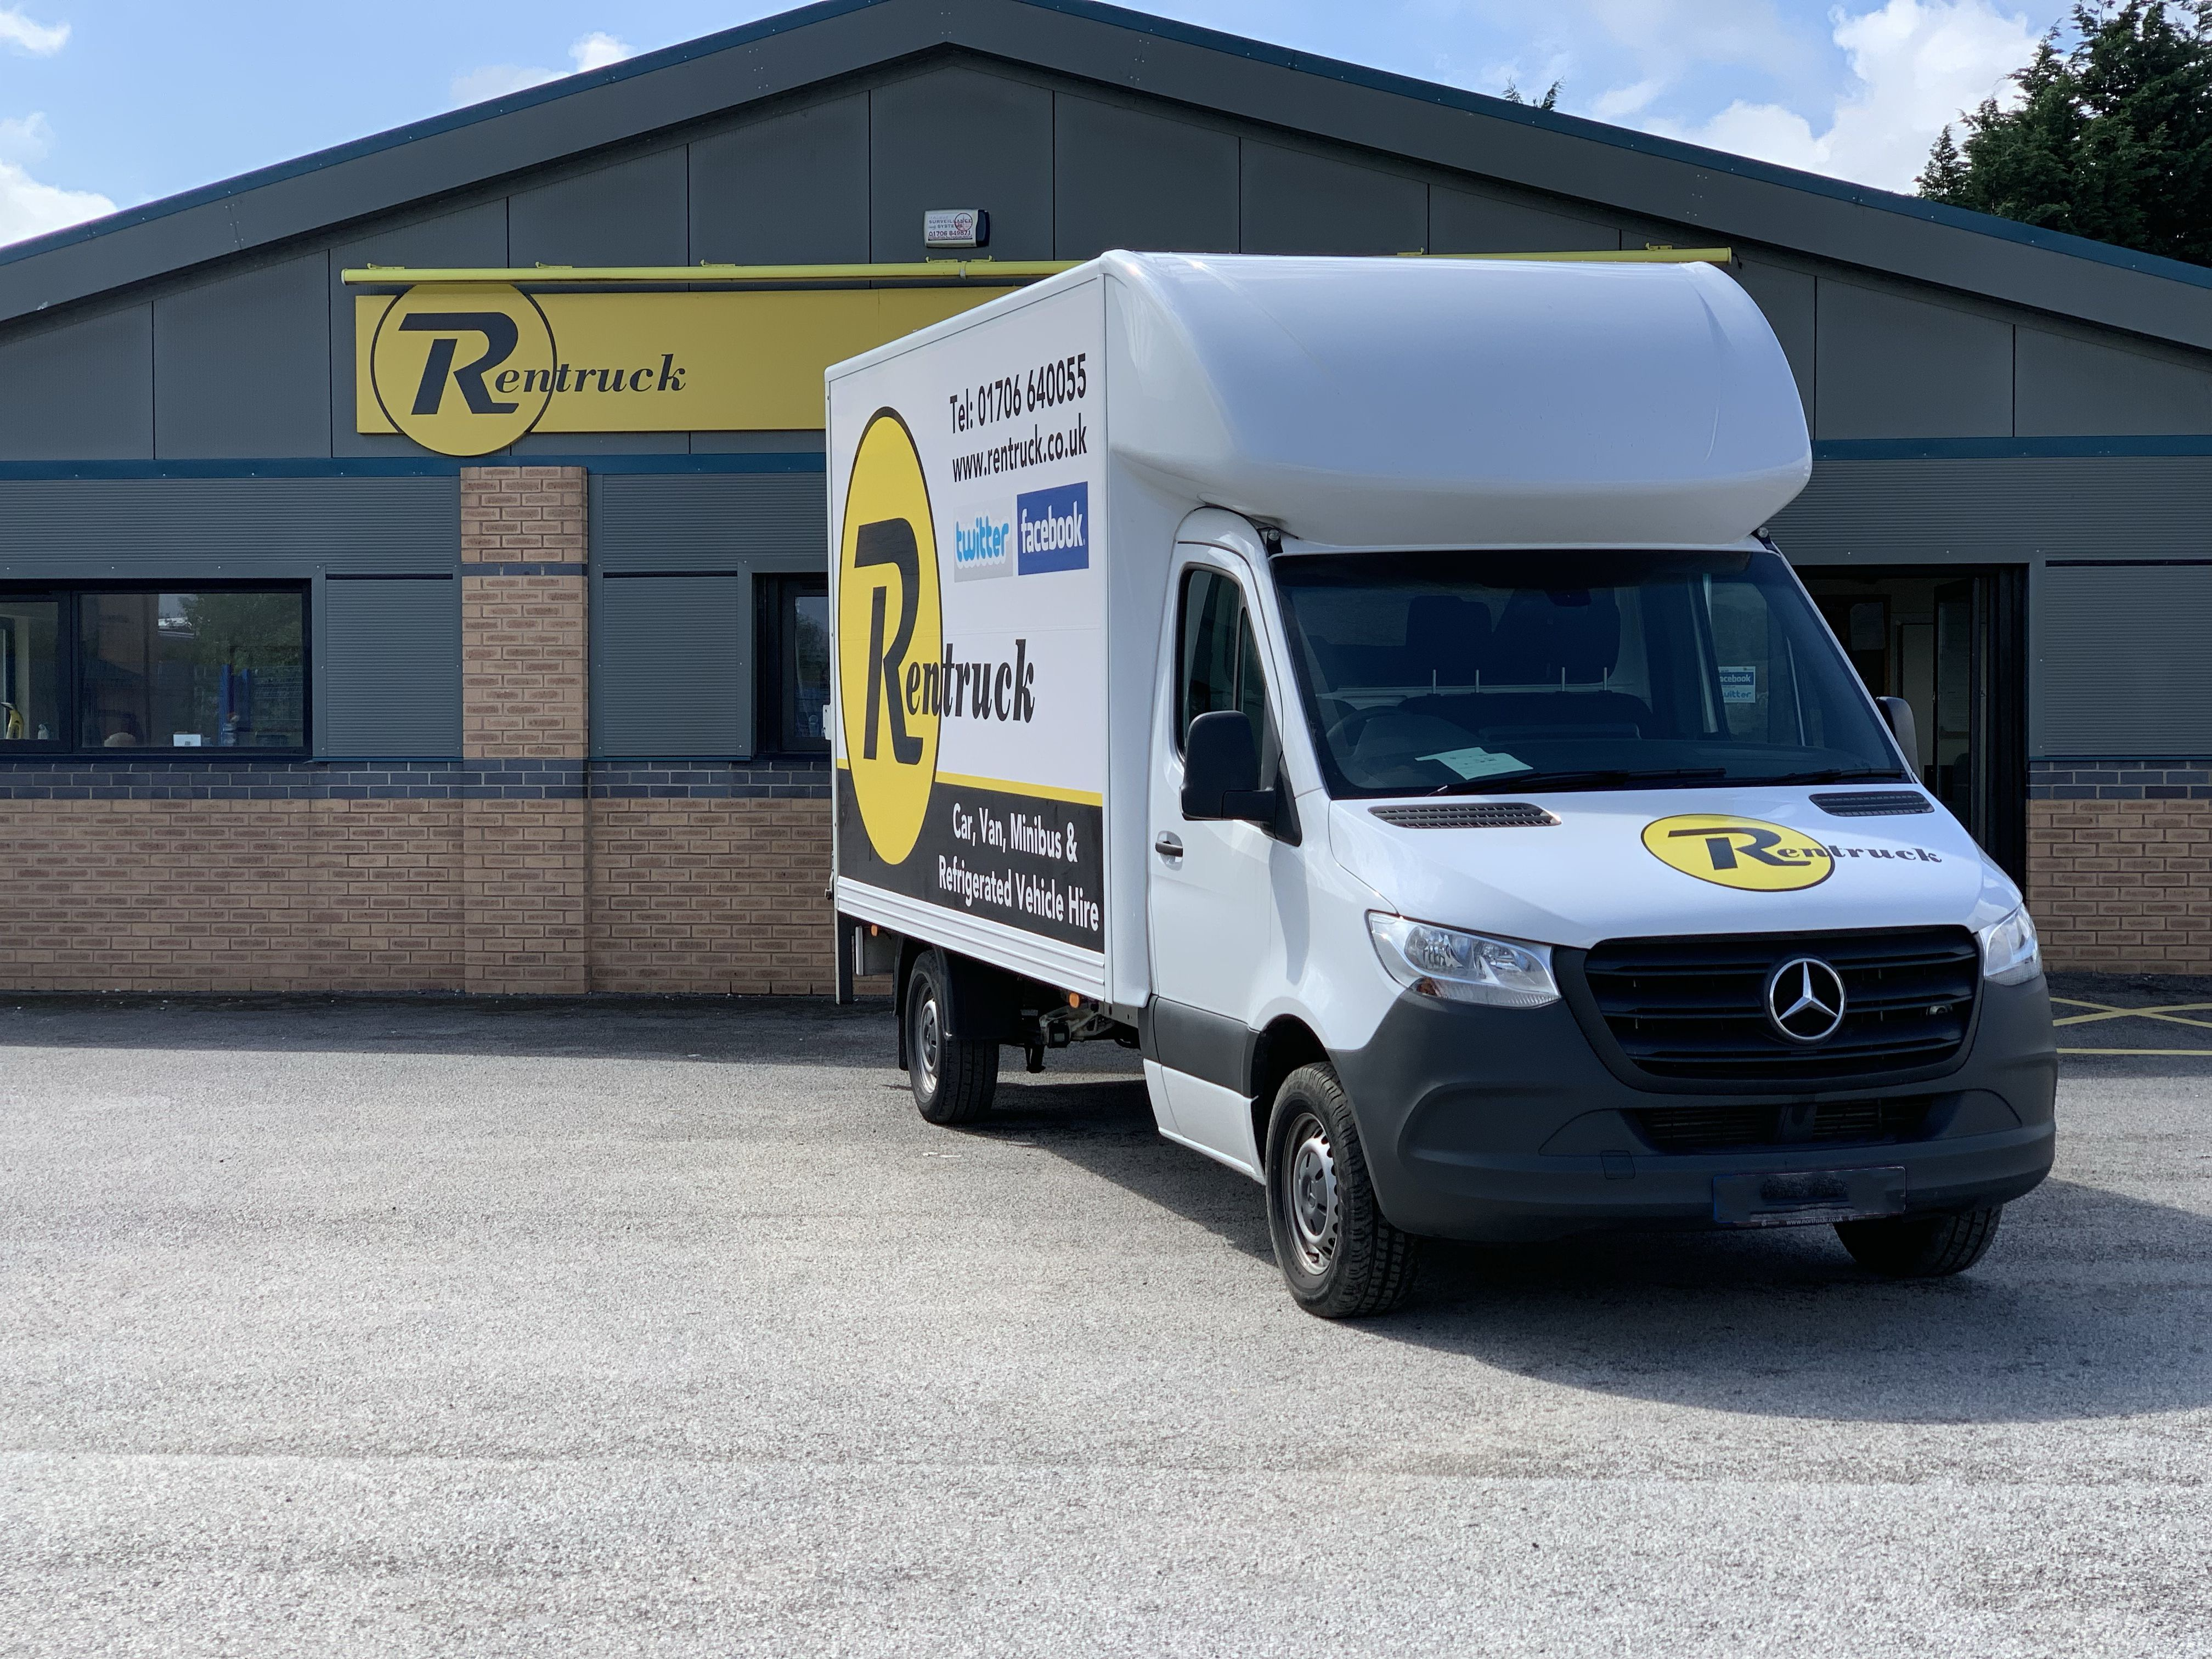 Mercedes Benz Sprinter Luton Box Van With Tail-Lift